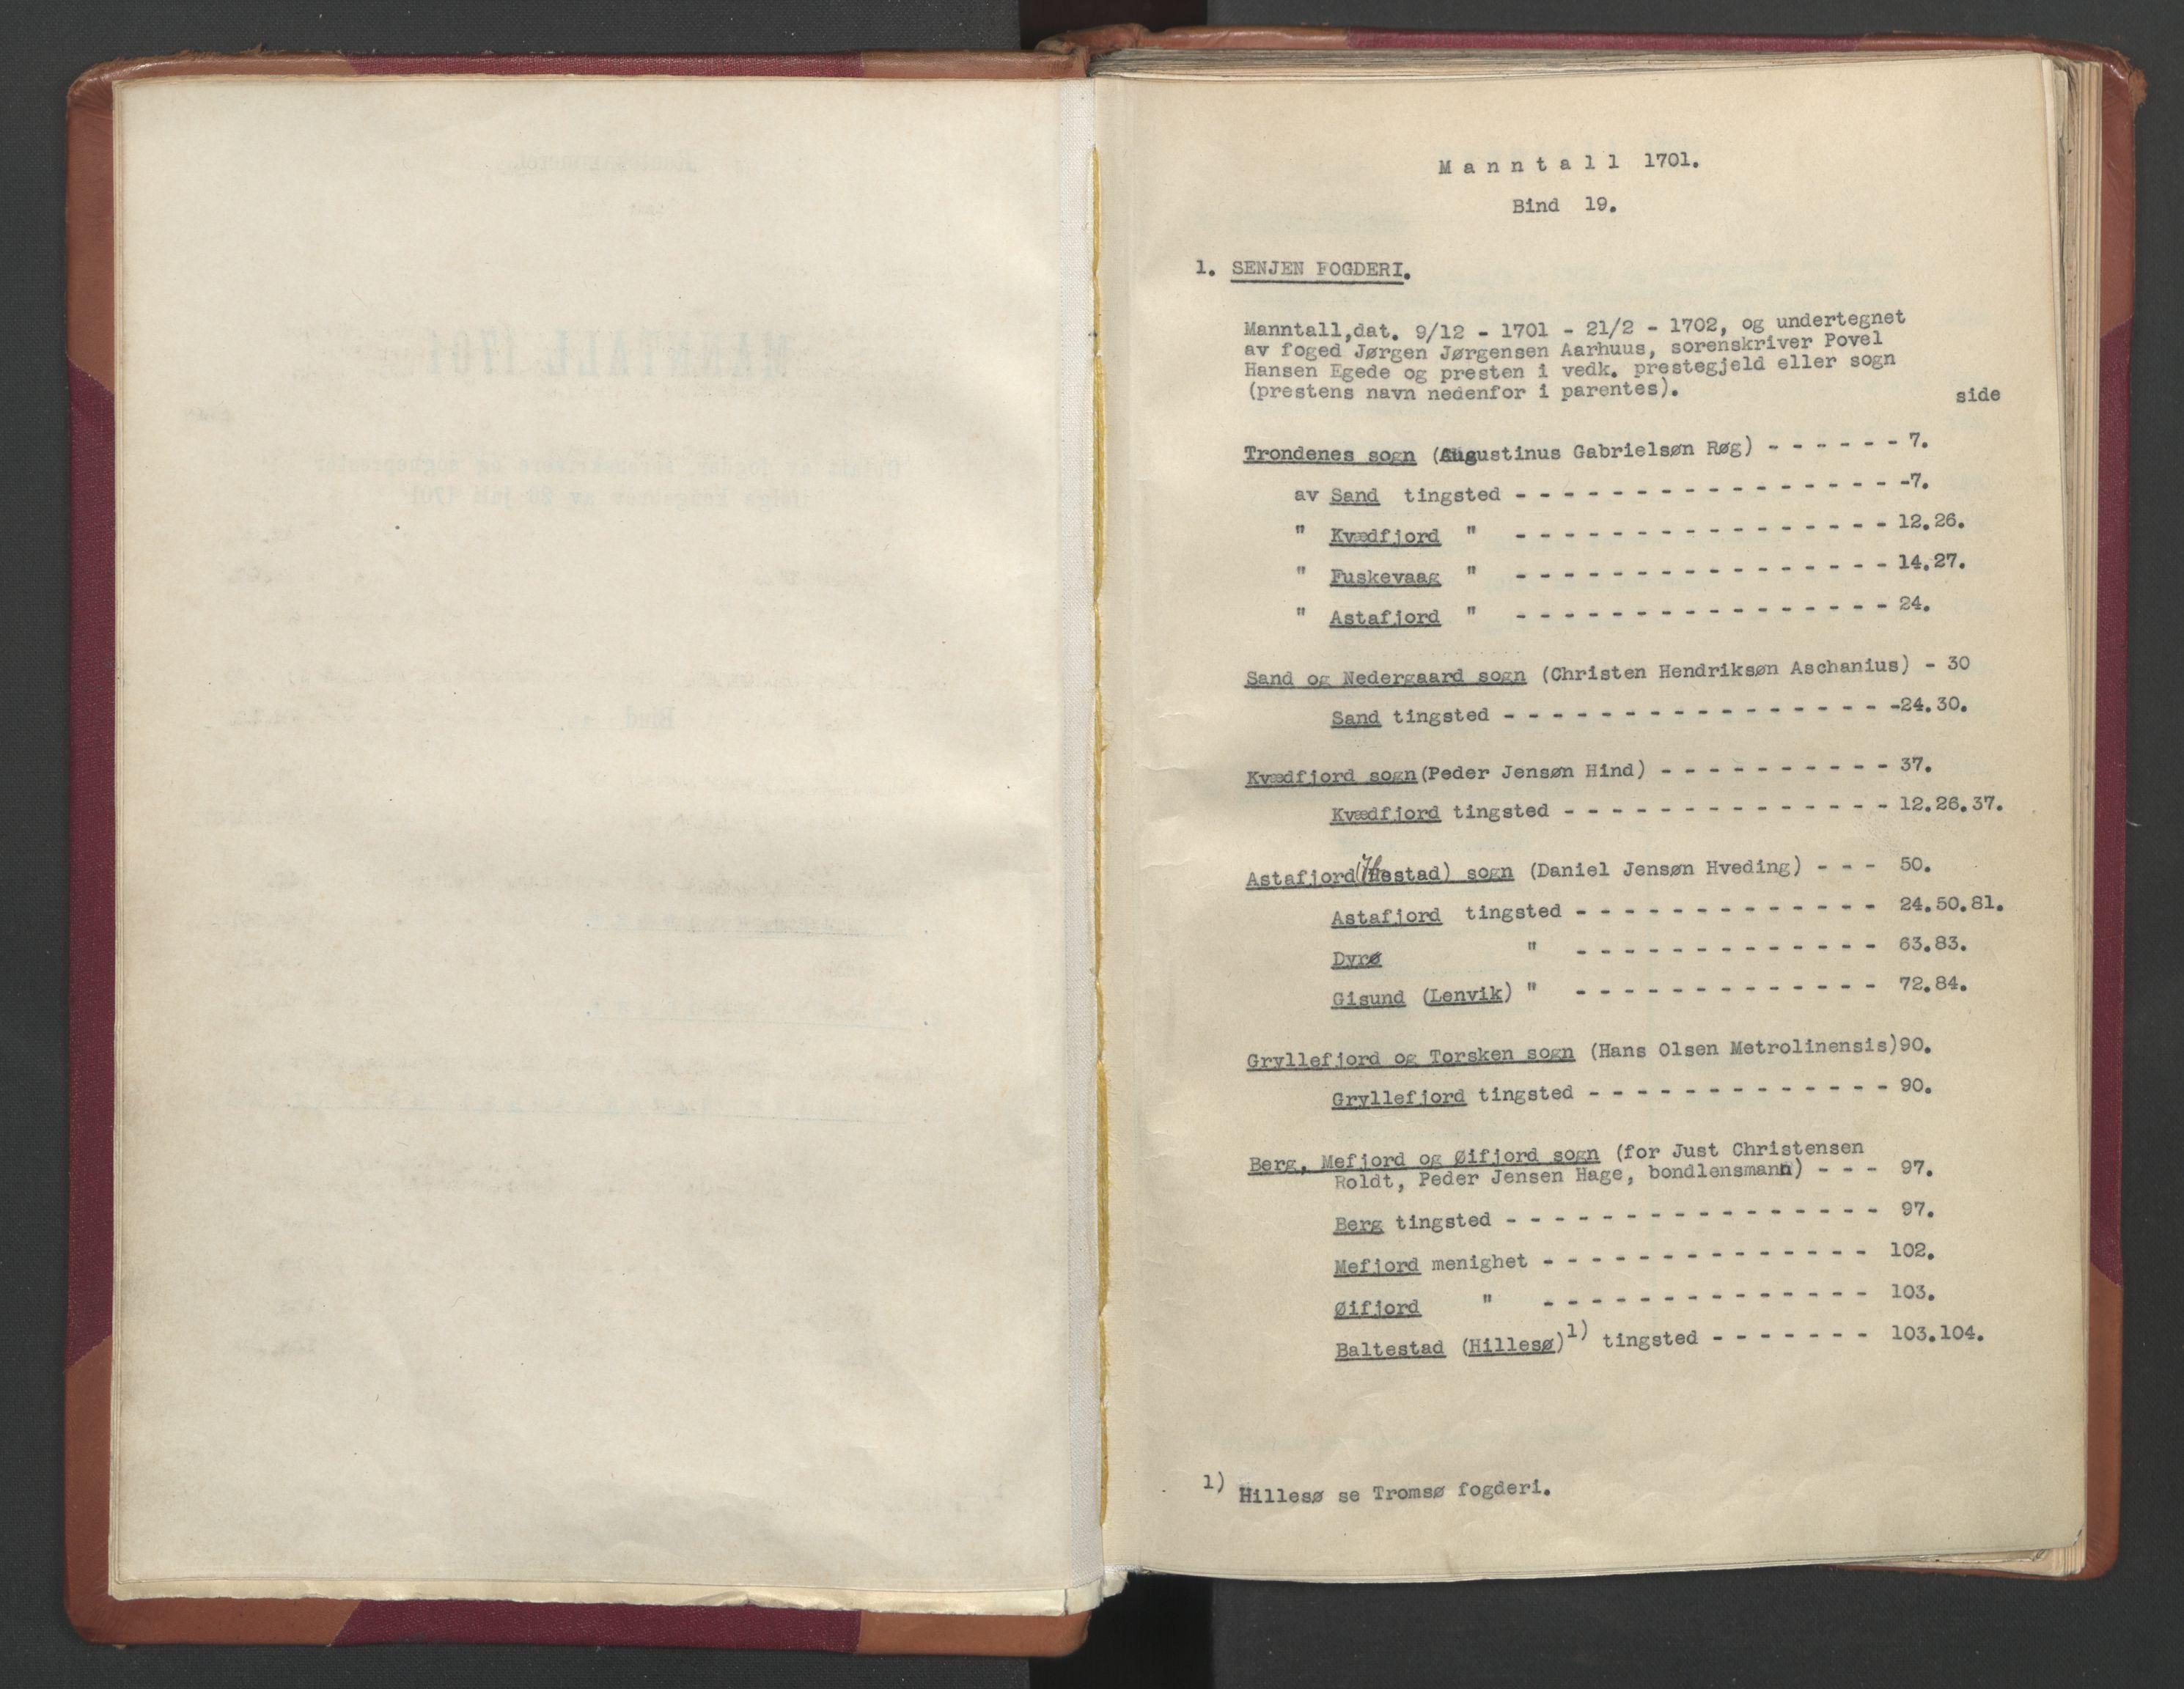 RA, Manntallet 1701, nr. 19: Senja og Tromsø fogderi, 1701, s. upaginert